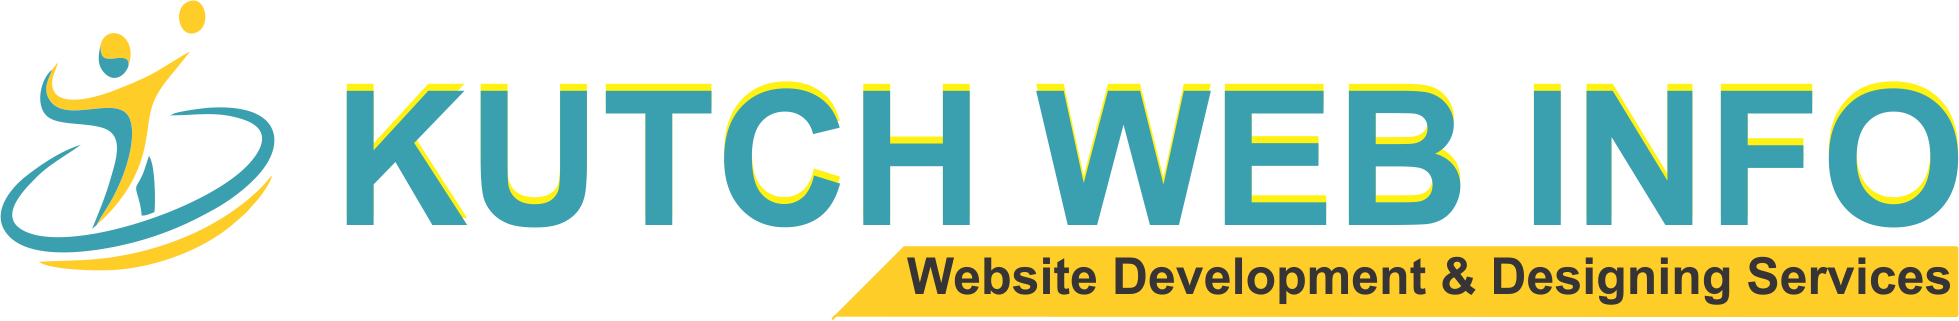 kutch web info logo